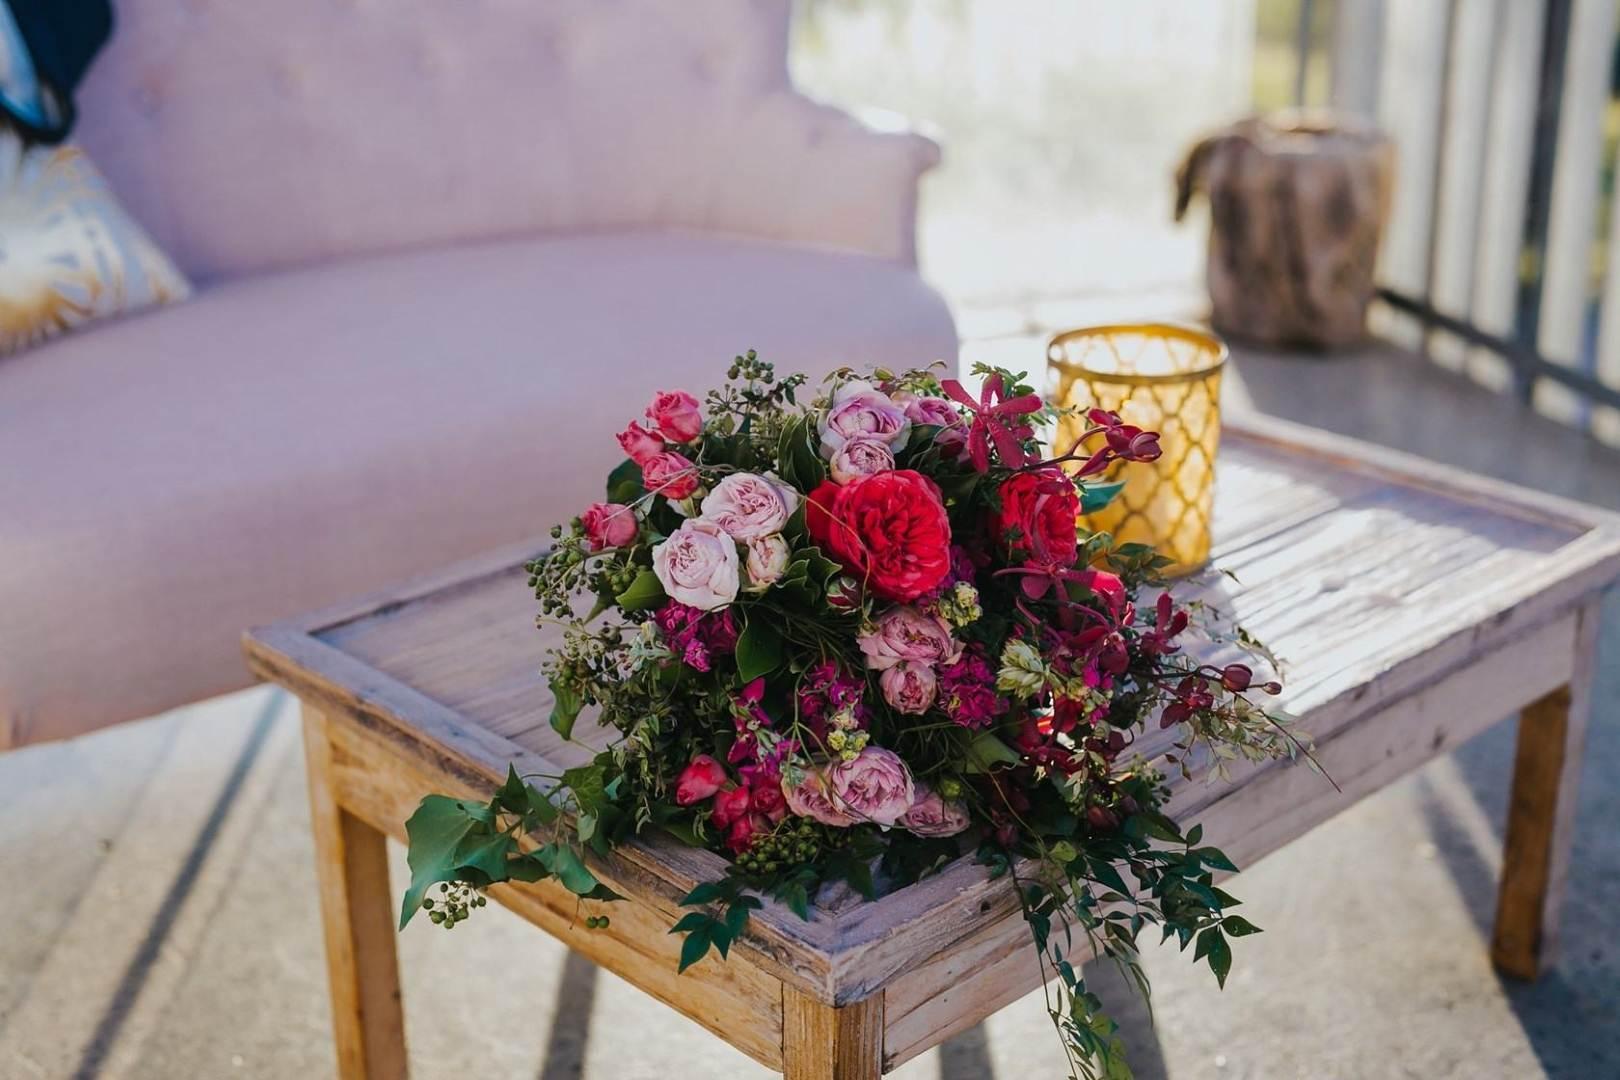 Wedding Venue - Tweed Gallery Cafe 8 on Veilability